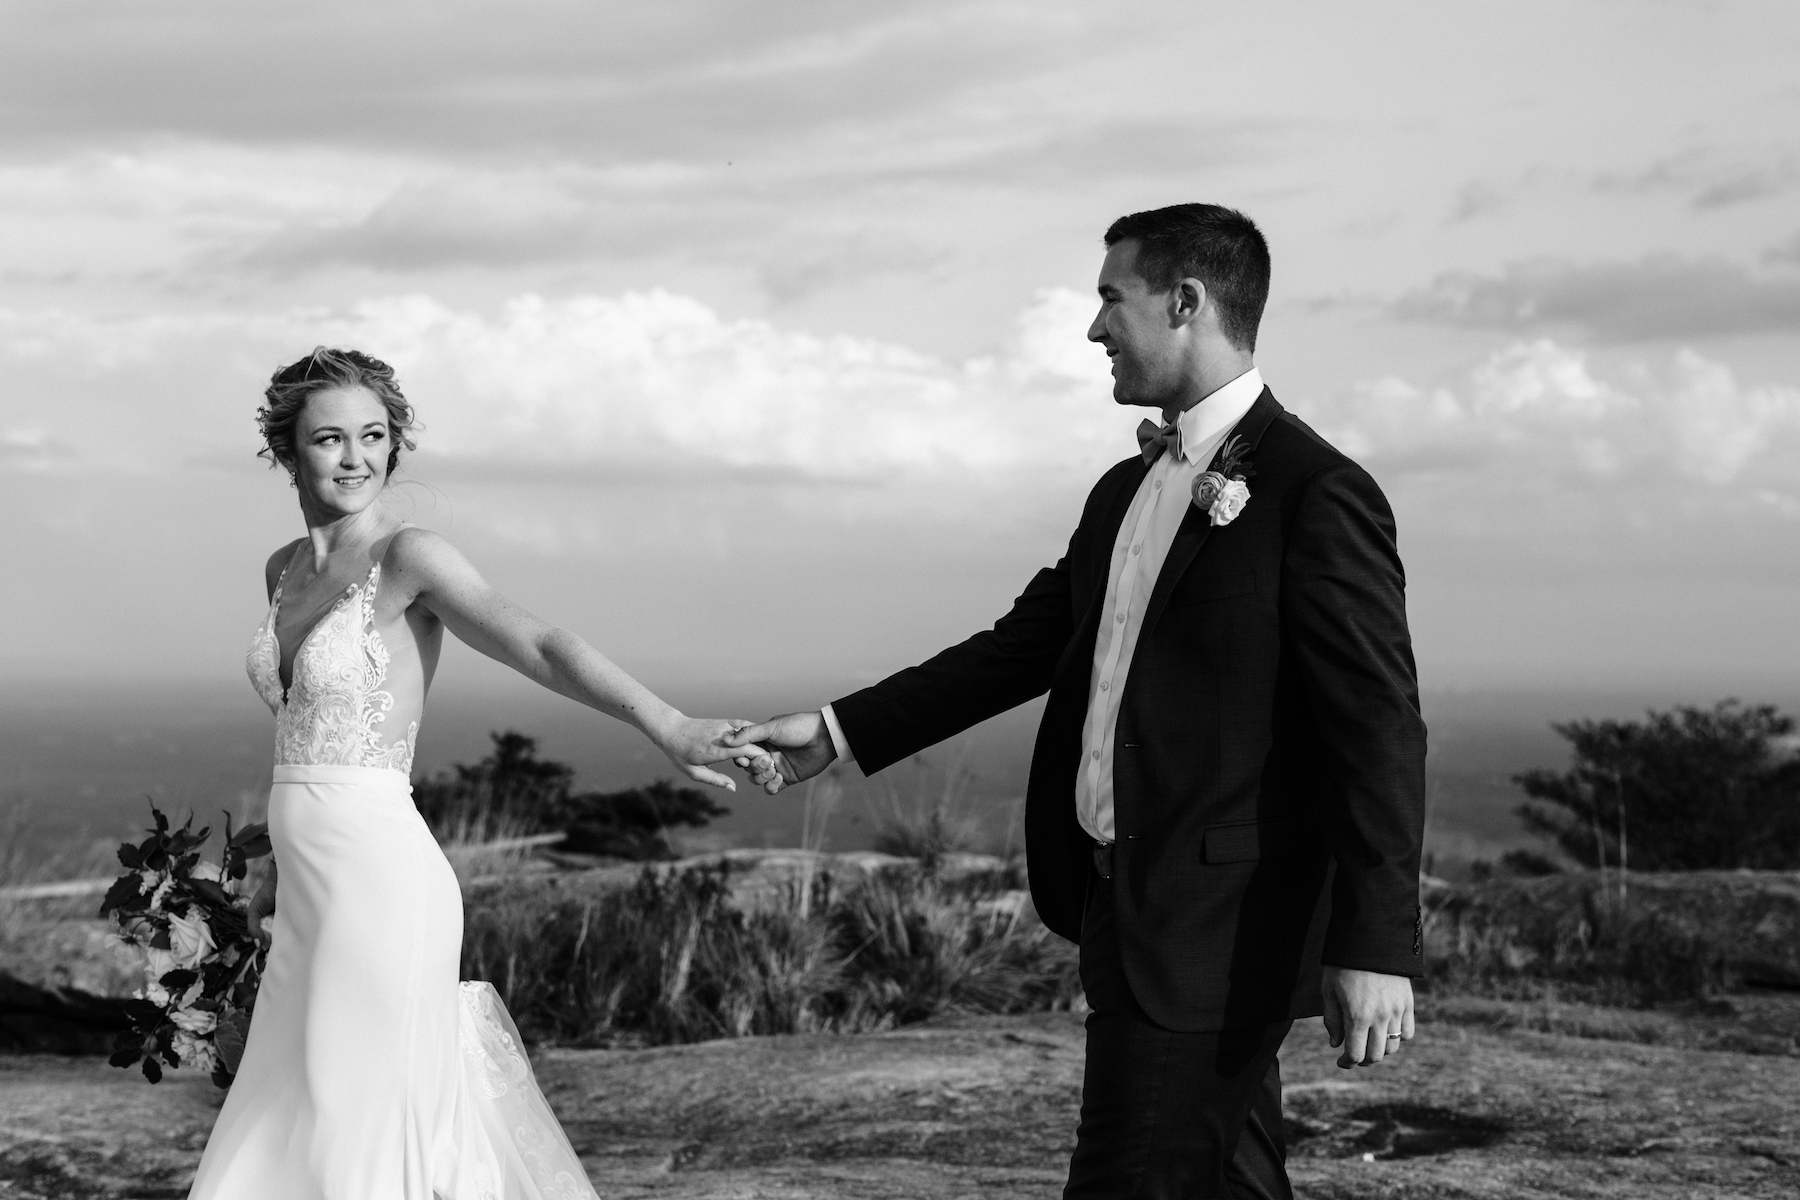 wedding-engagement-photographer-spartanburg-greenville-columbia-carolina-south-north-535.JPG